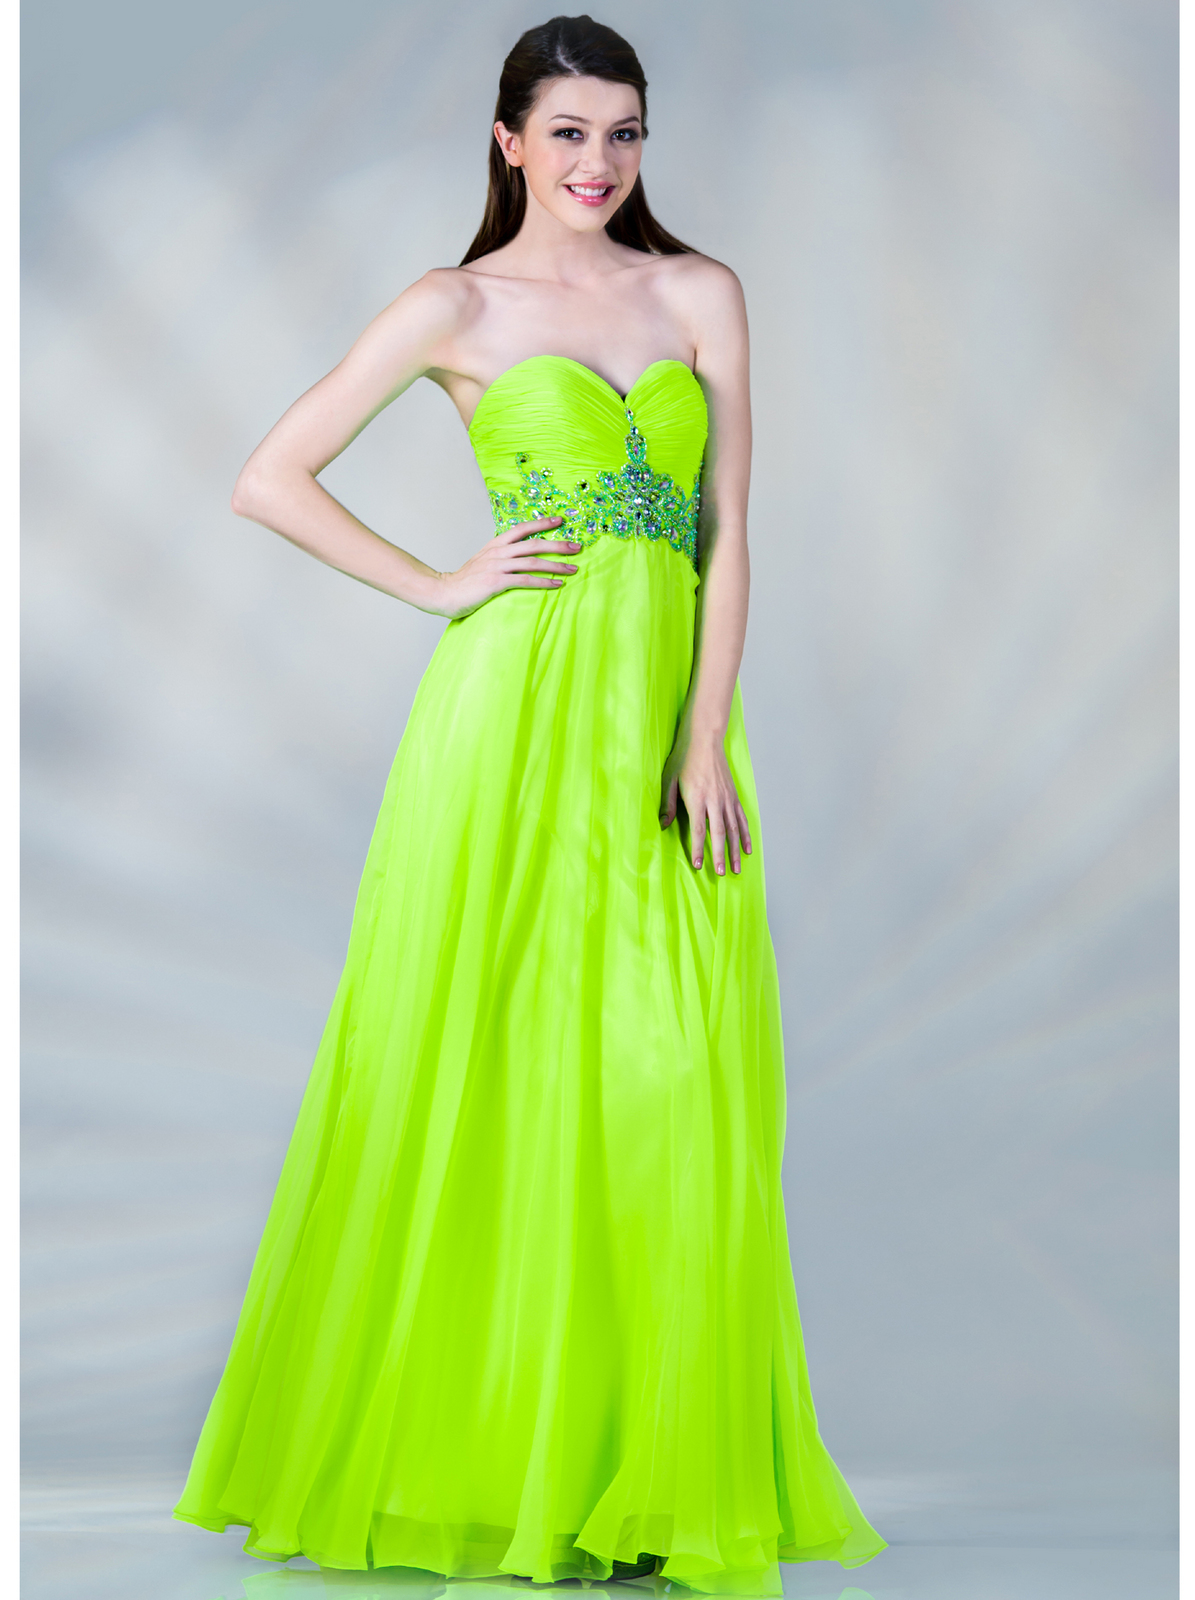 Prom Dress Shops Valdosta Ga - Boutique Prom Dresses